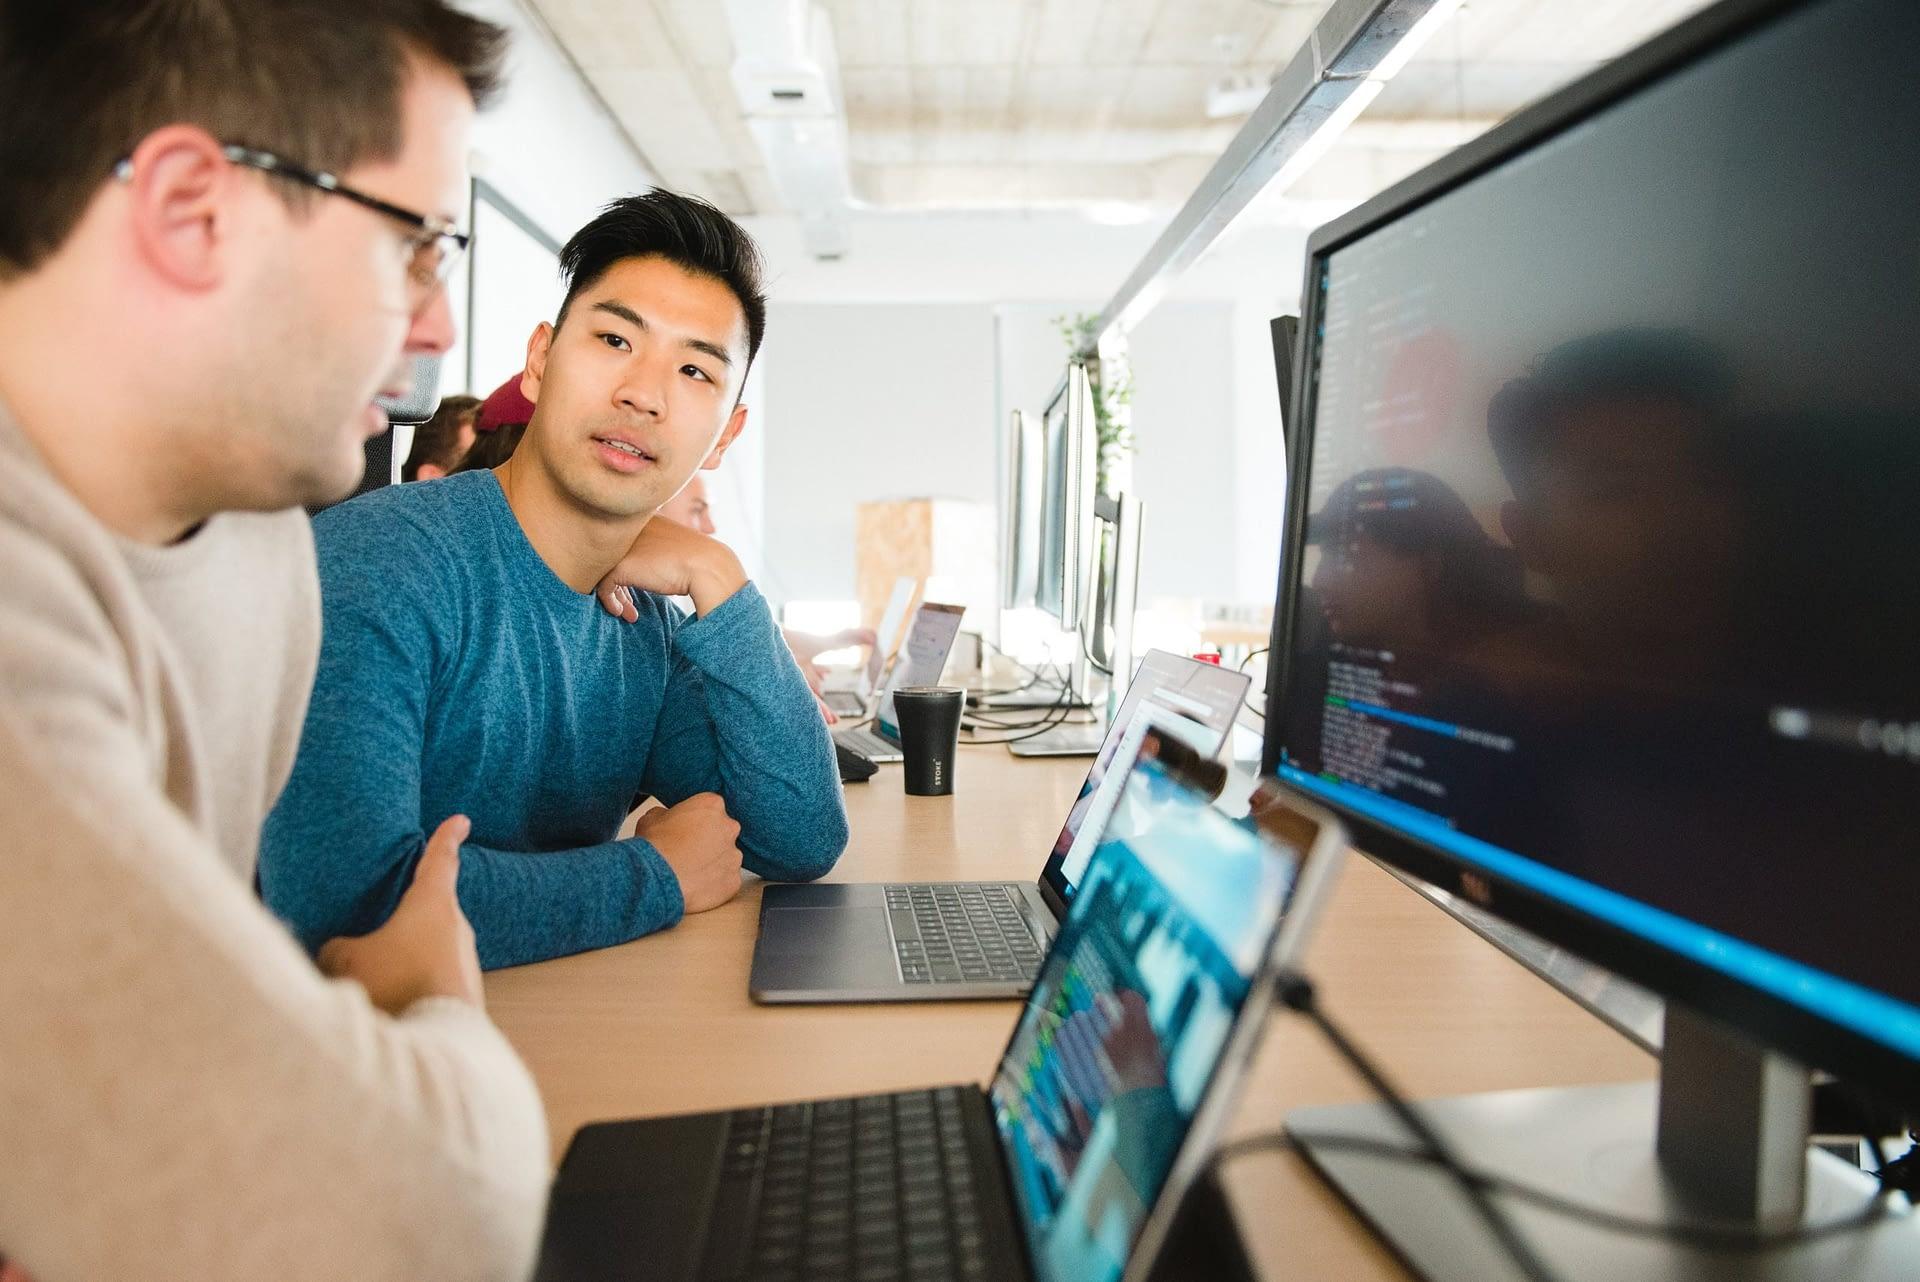 Students solve coding challenges together at Codeworks